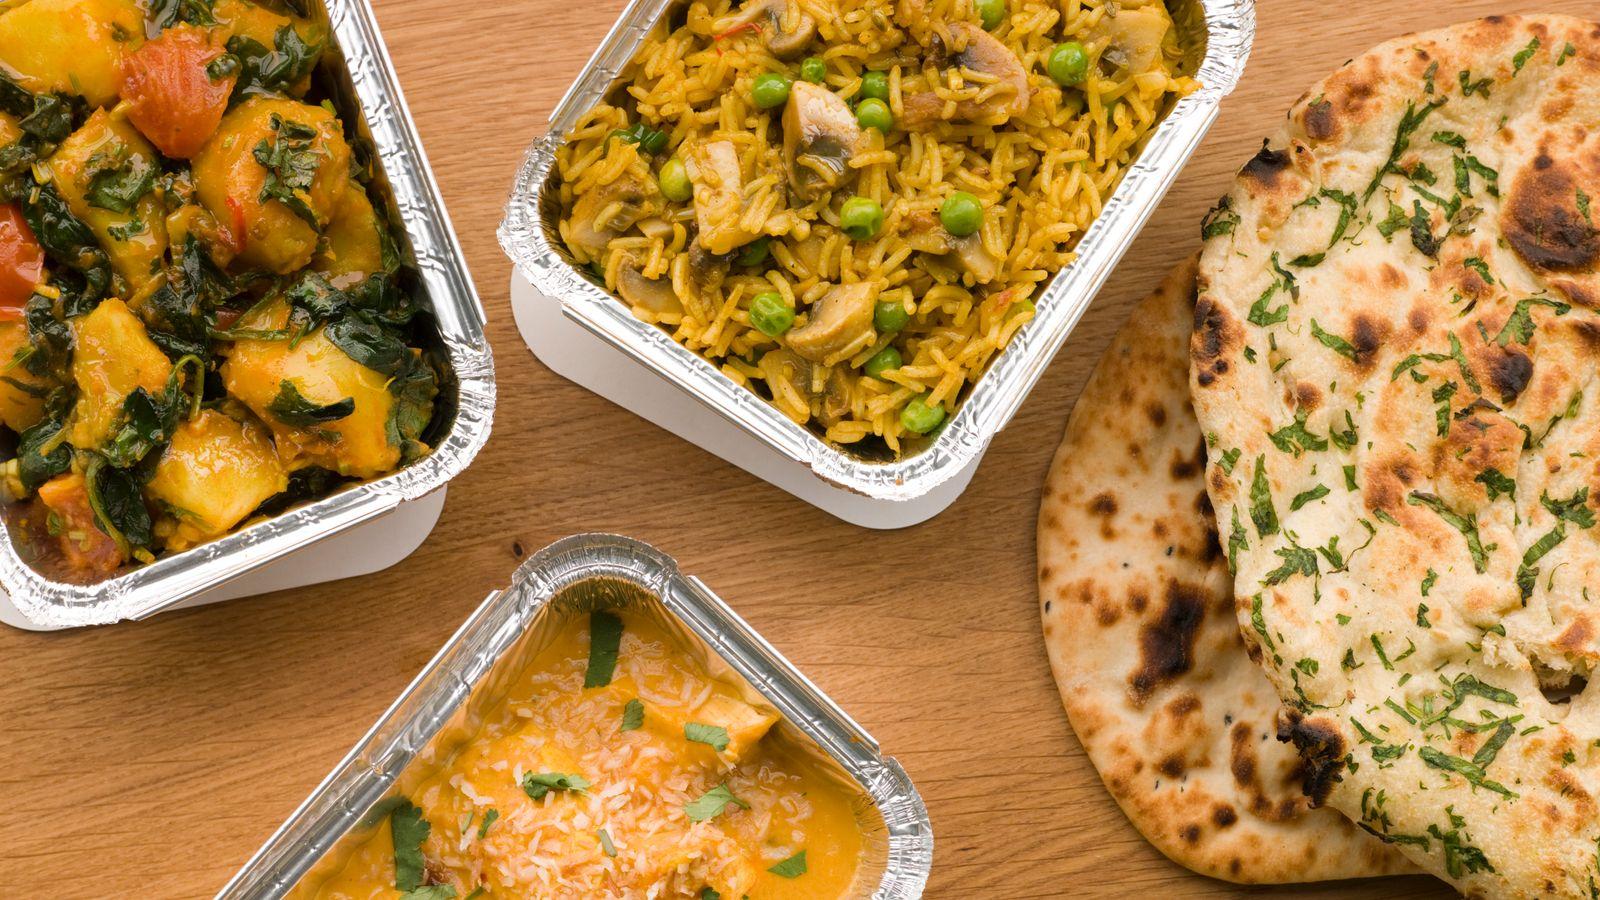 Generic takeaway picture - Chicken Korma, Sag Aloo, Mushroom Pilau And Naan Bread - Stock image